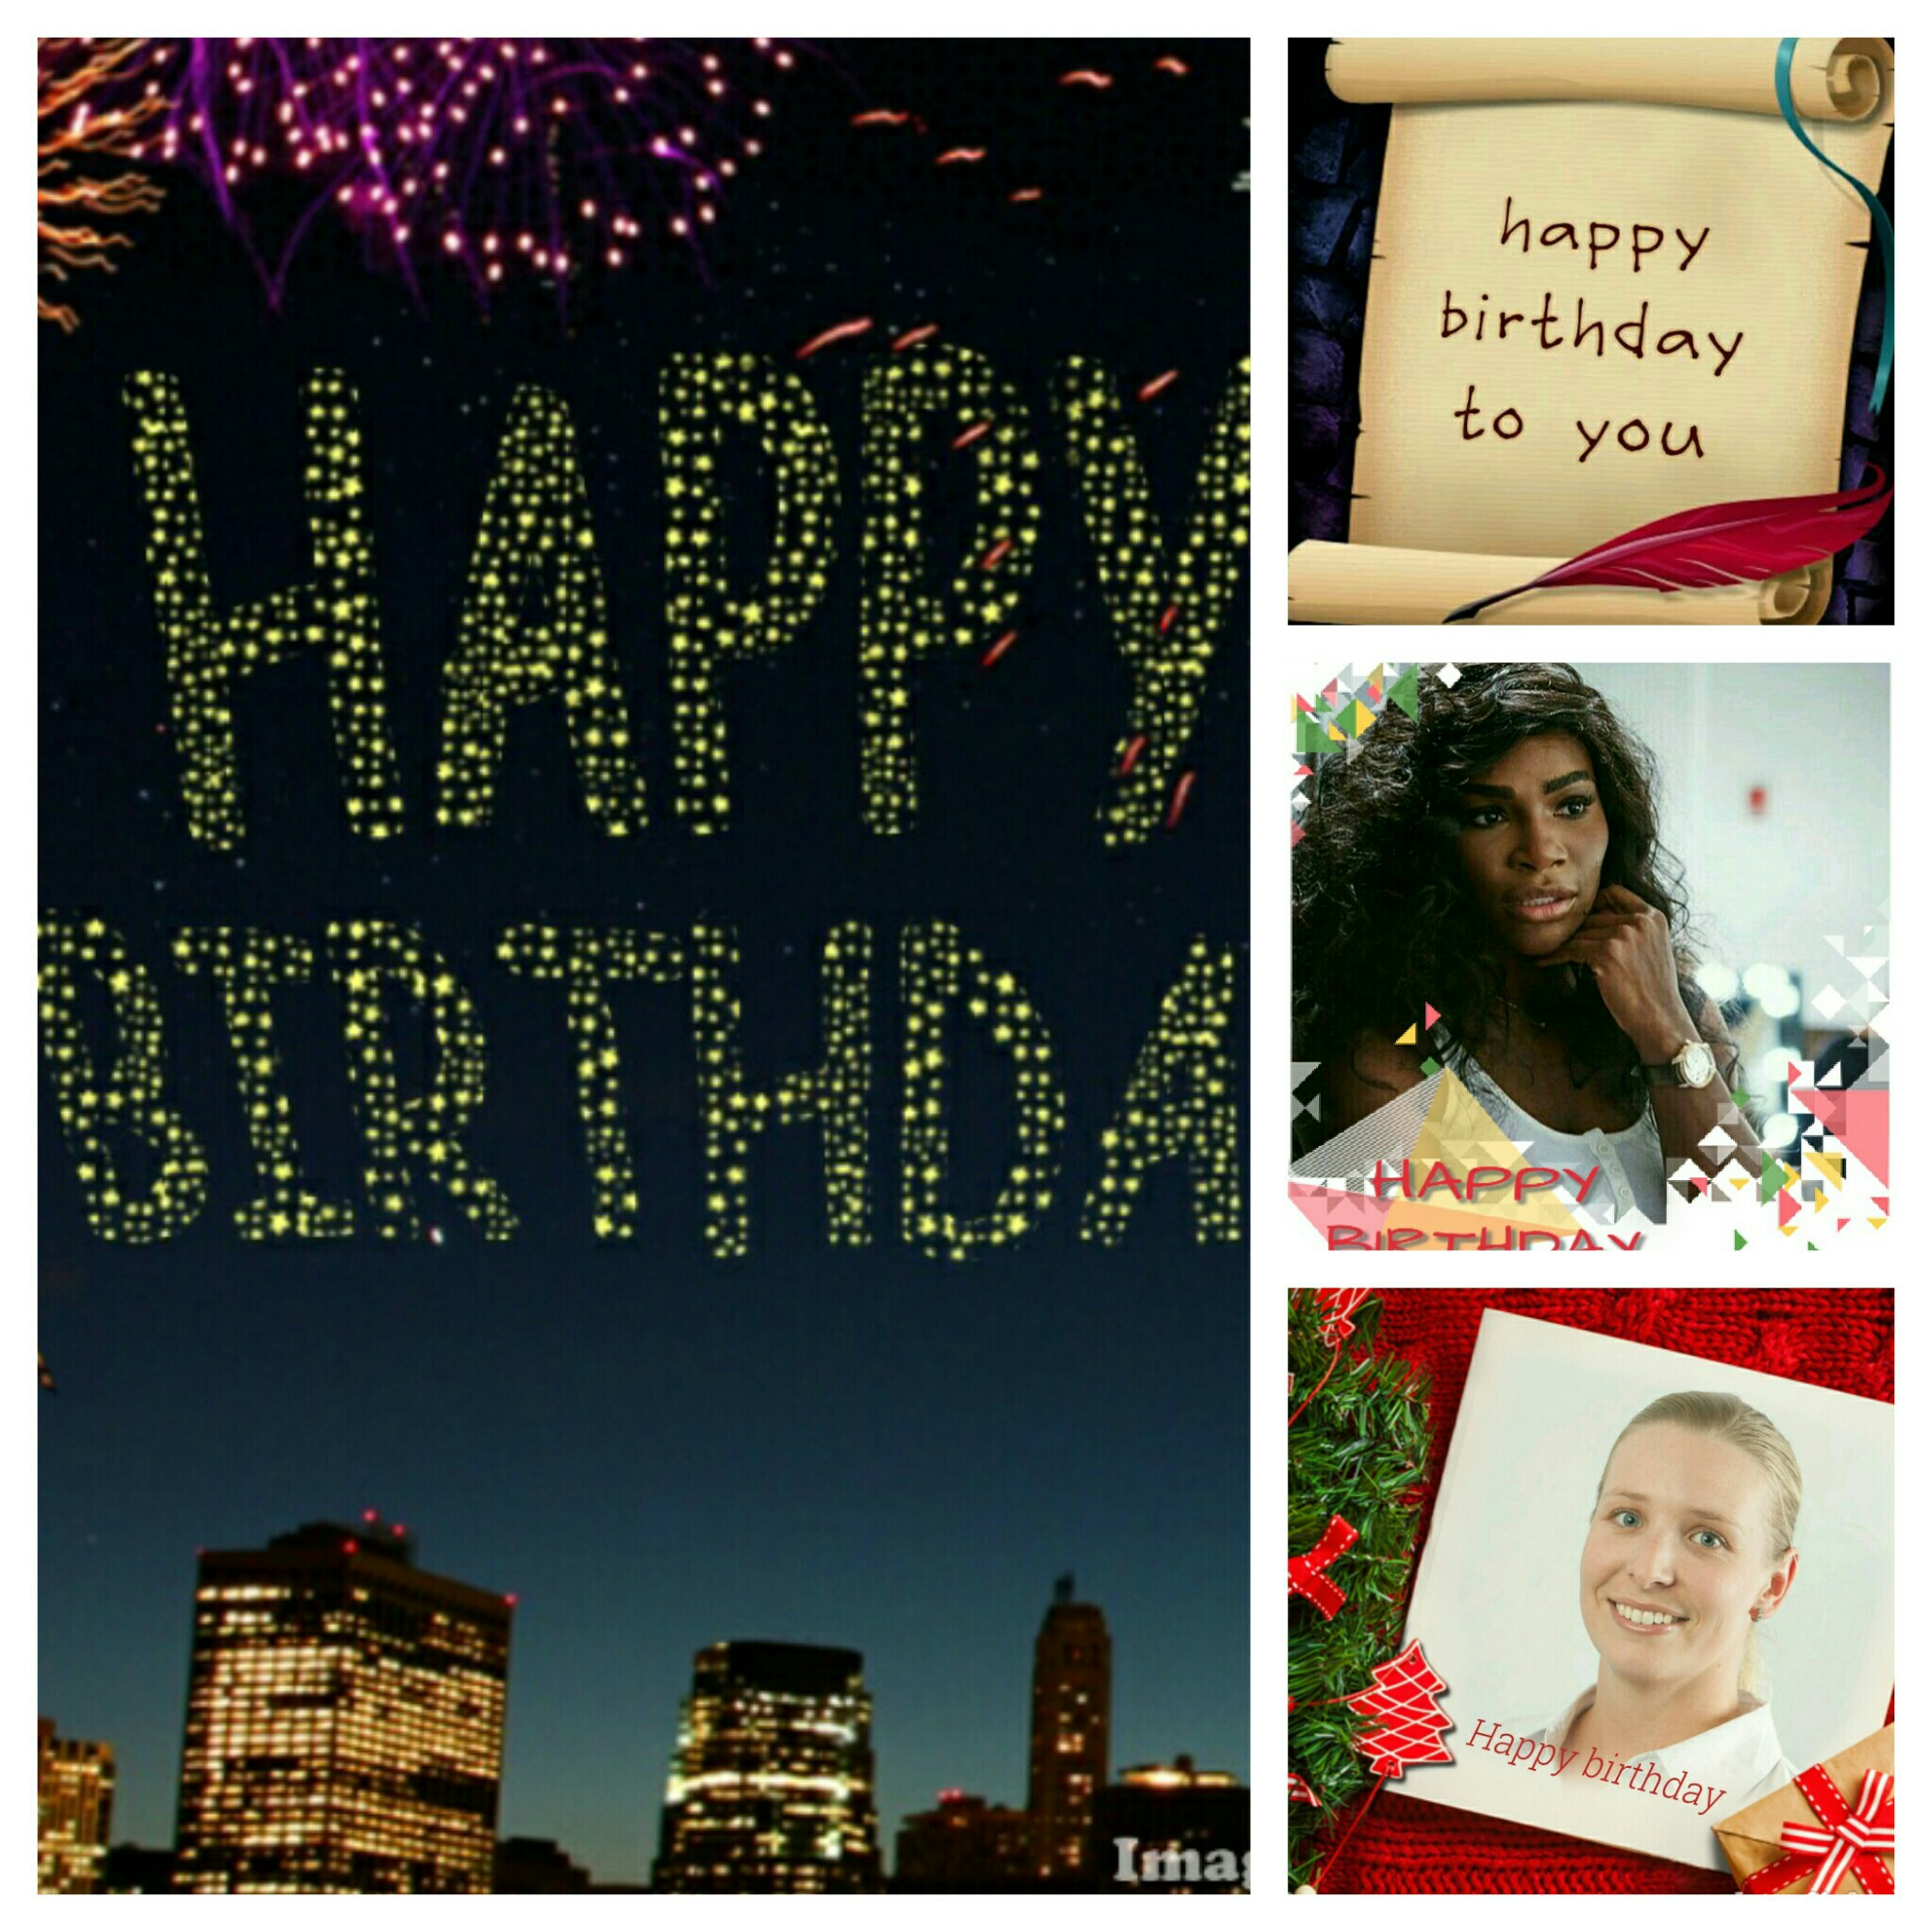 Wish someone a happy birthday